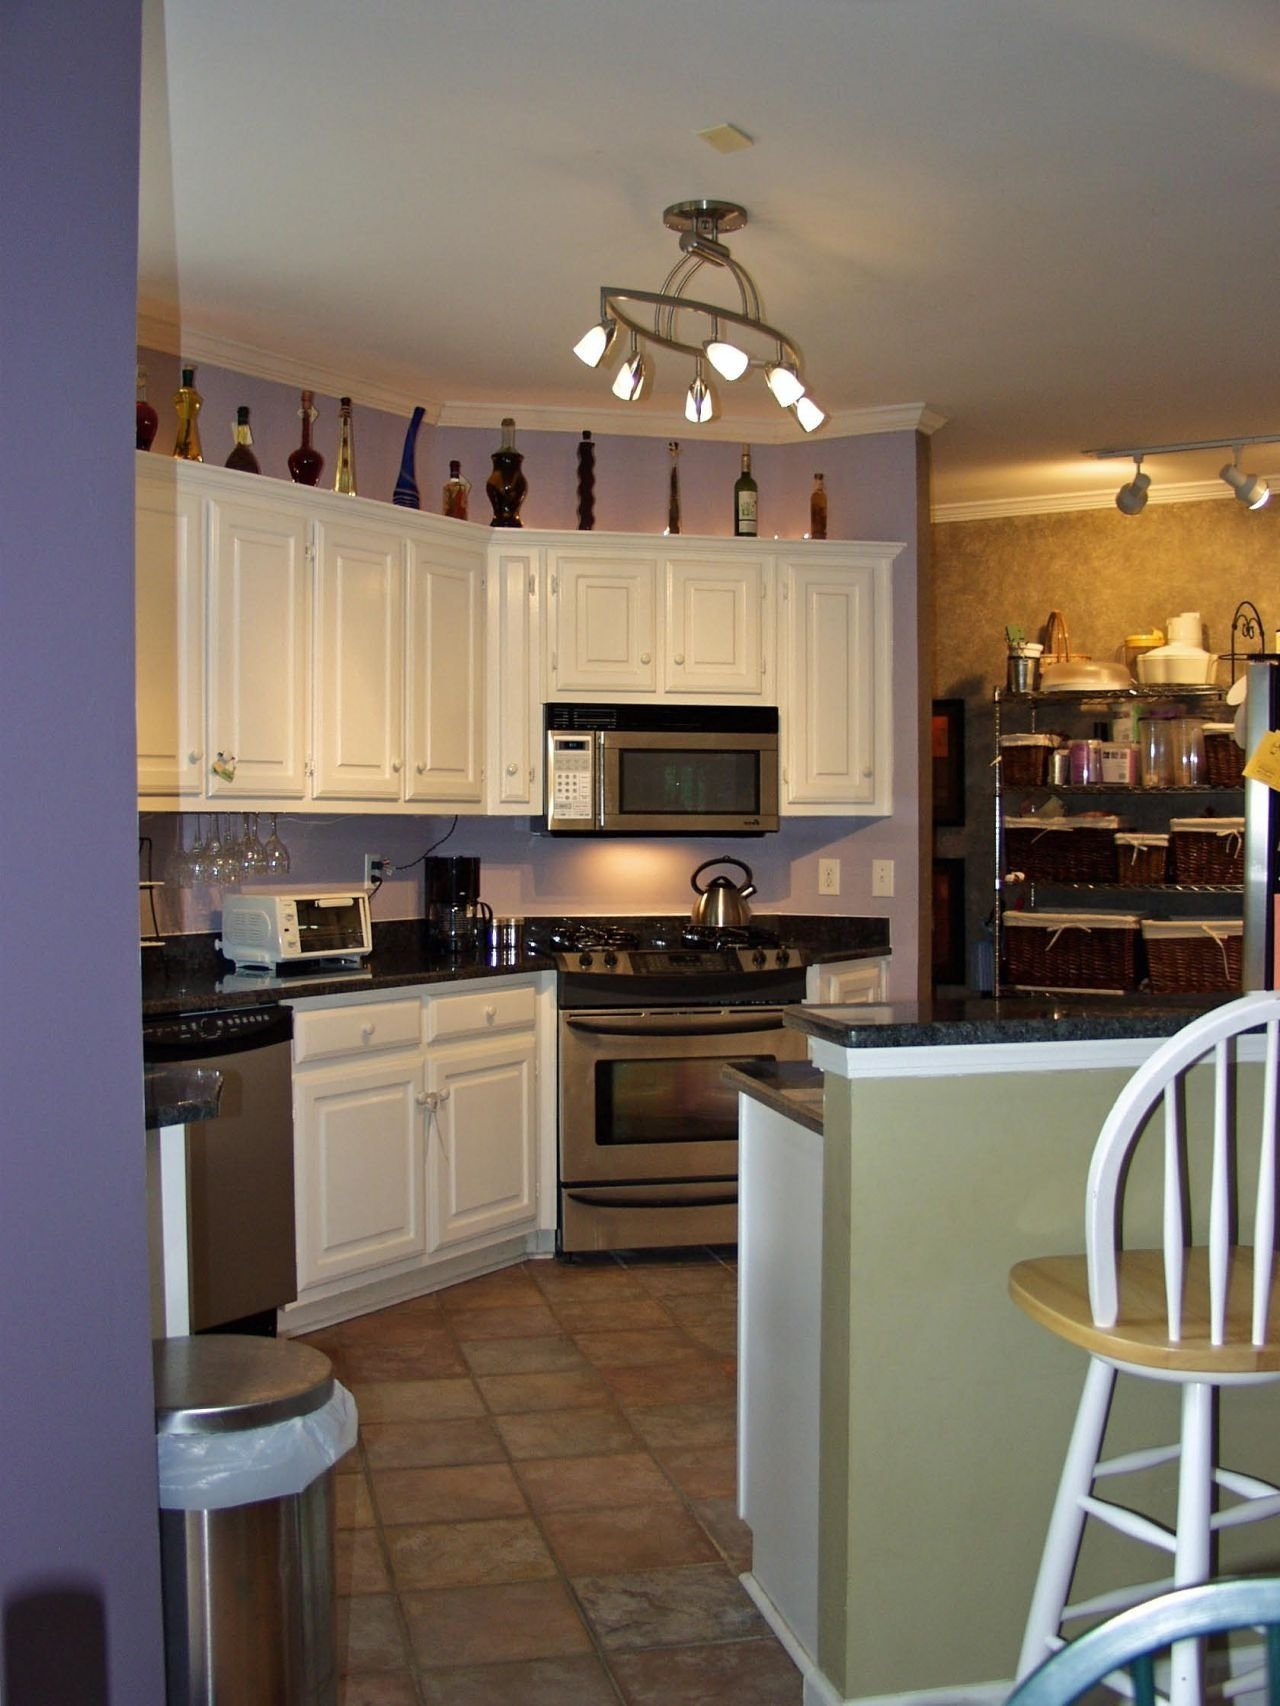 10 Unique Kitchen Lighting Ideas Small Kitchen kitchen light fixtures for small kitchens illuminating the kitchen